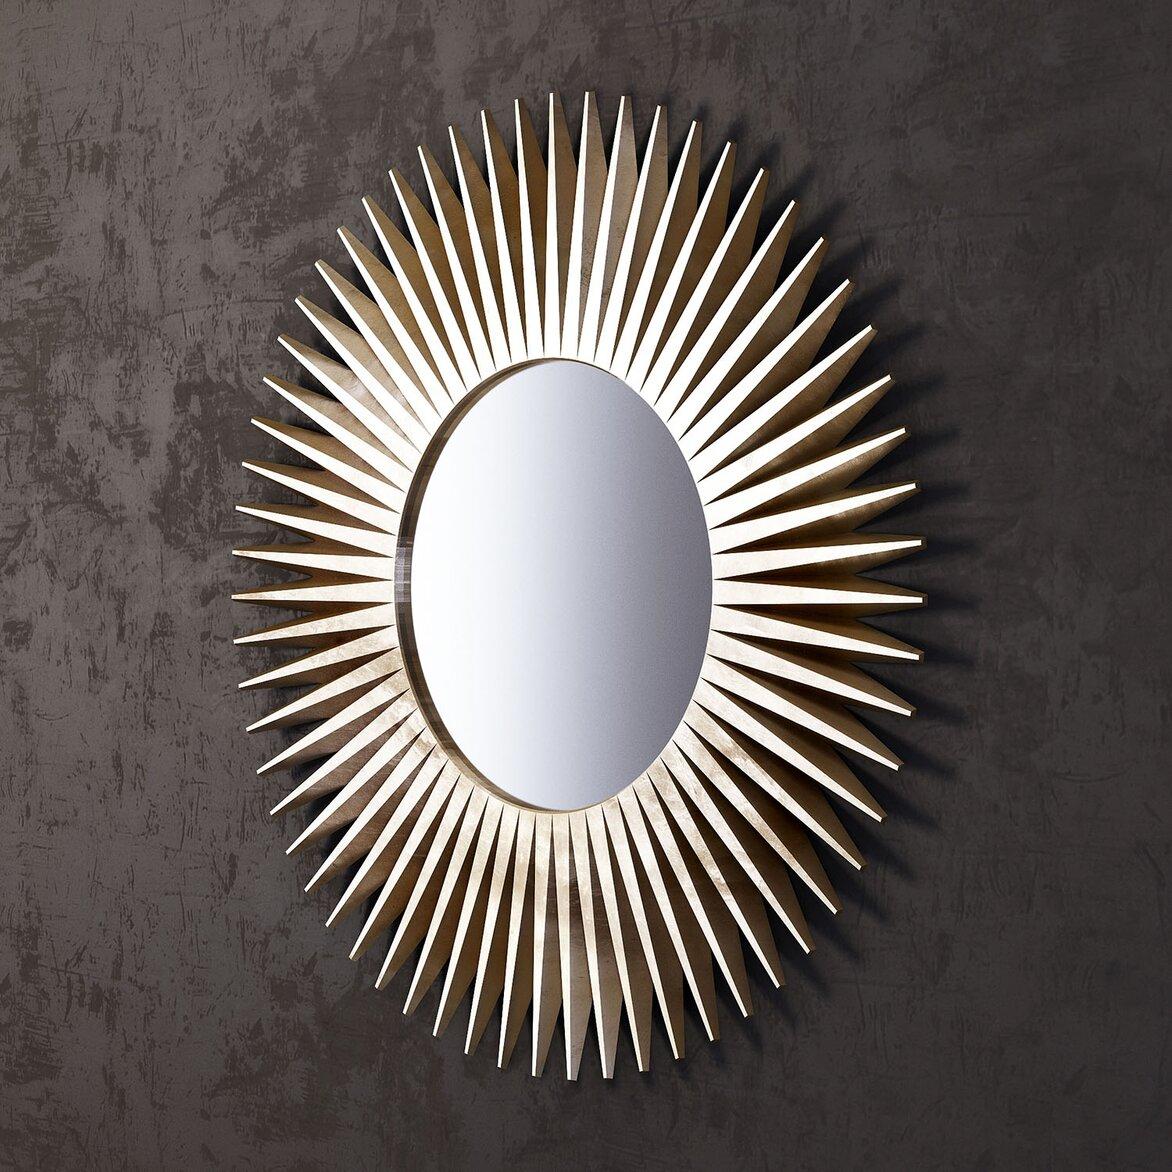 Зеркало-солнце Rays, золотое (полуоборот)